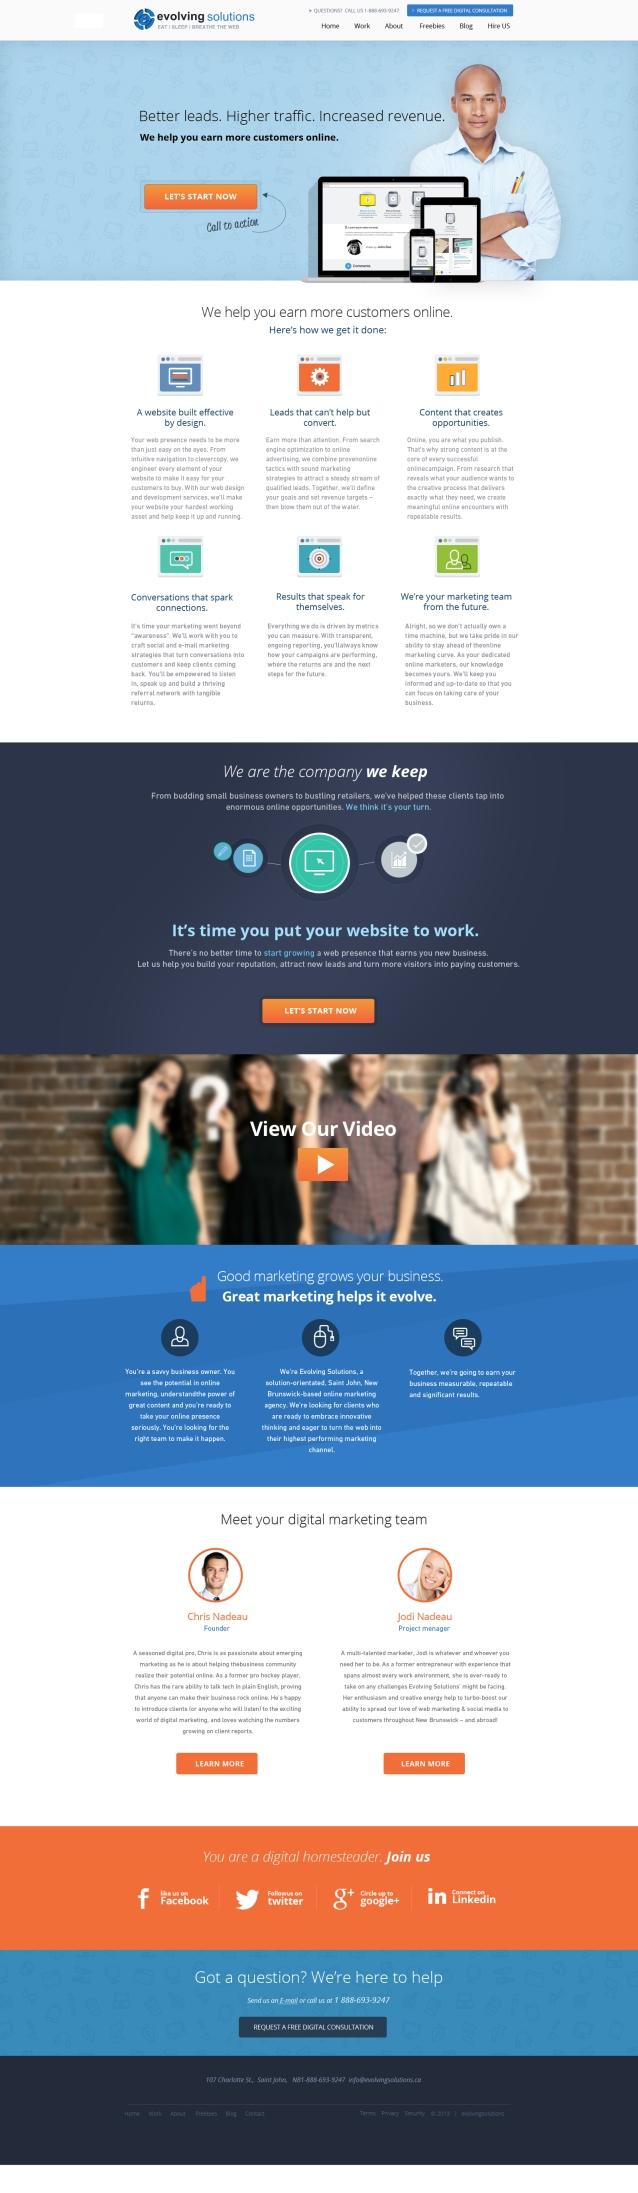 Evolving Solutions New Design #3